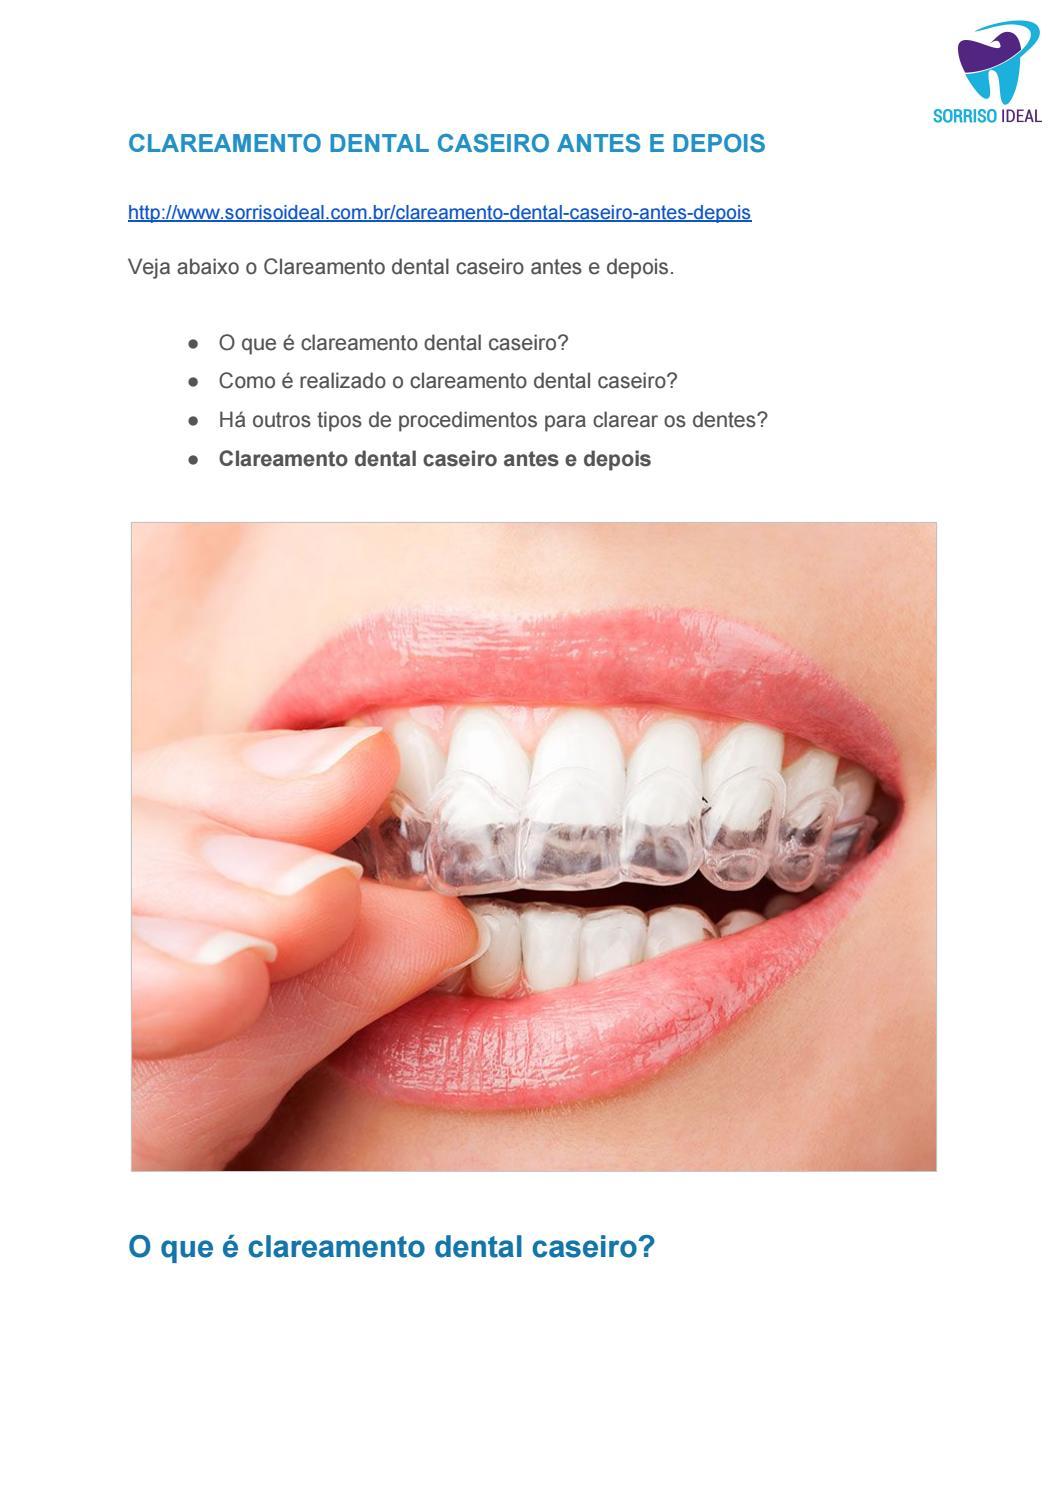 Clareamento Dental Caseiro Antes E Depois By Sorriso Ideal Issuu